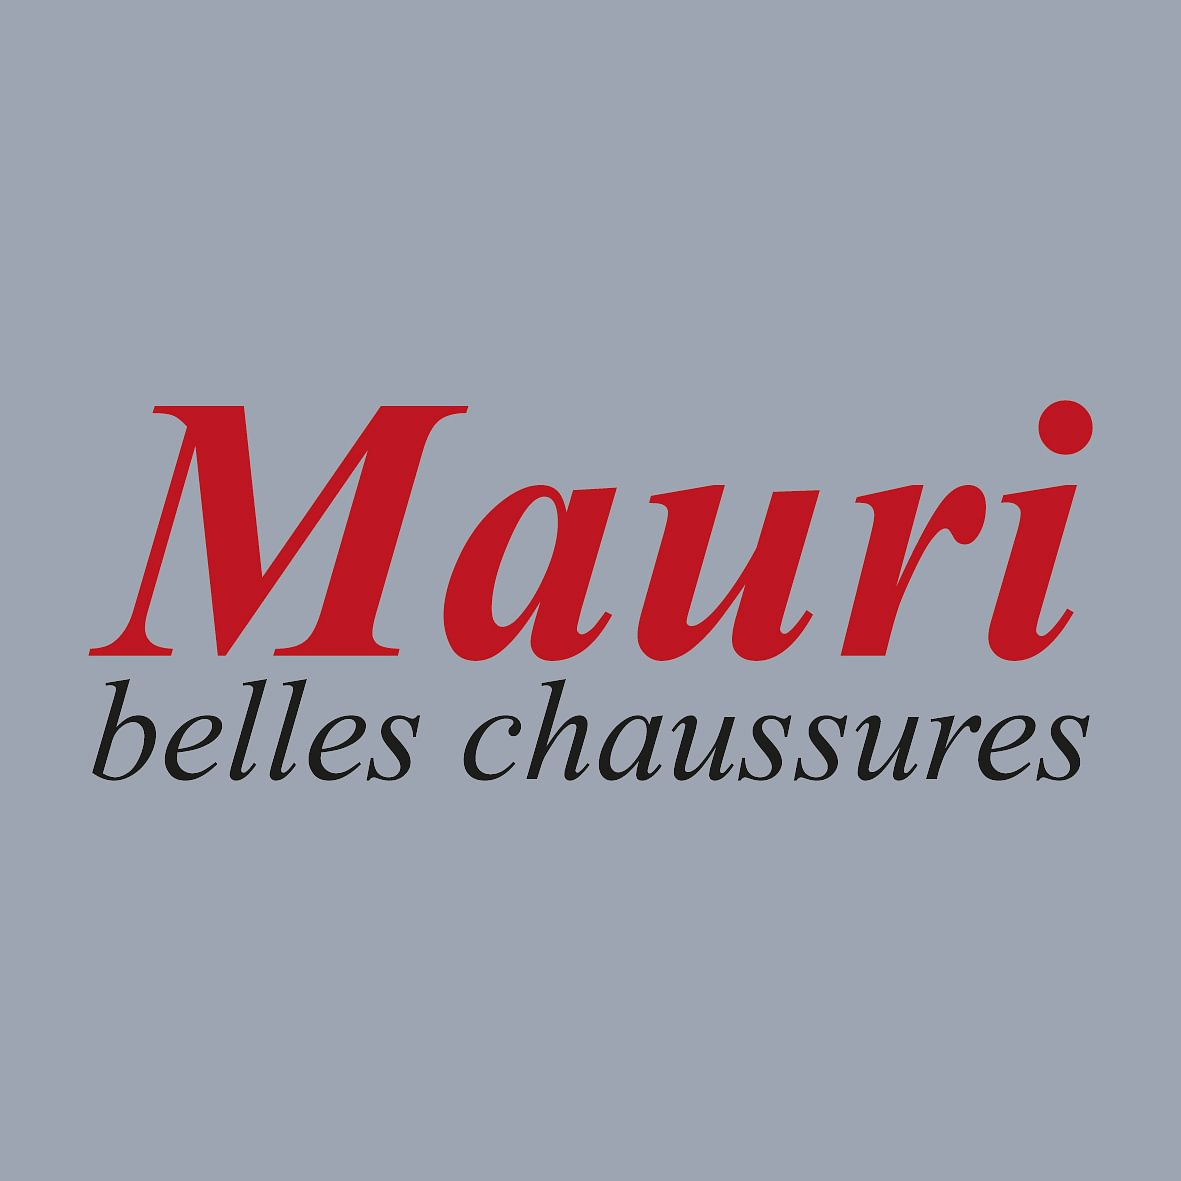 Chaussures Mauri & Cie SA